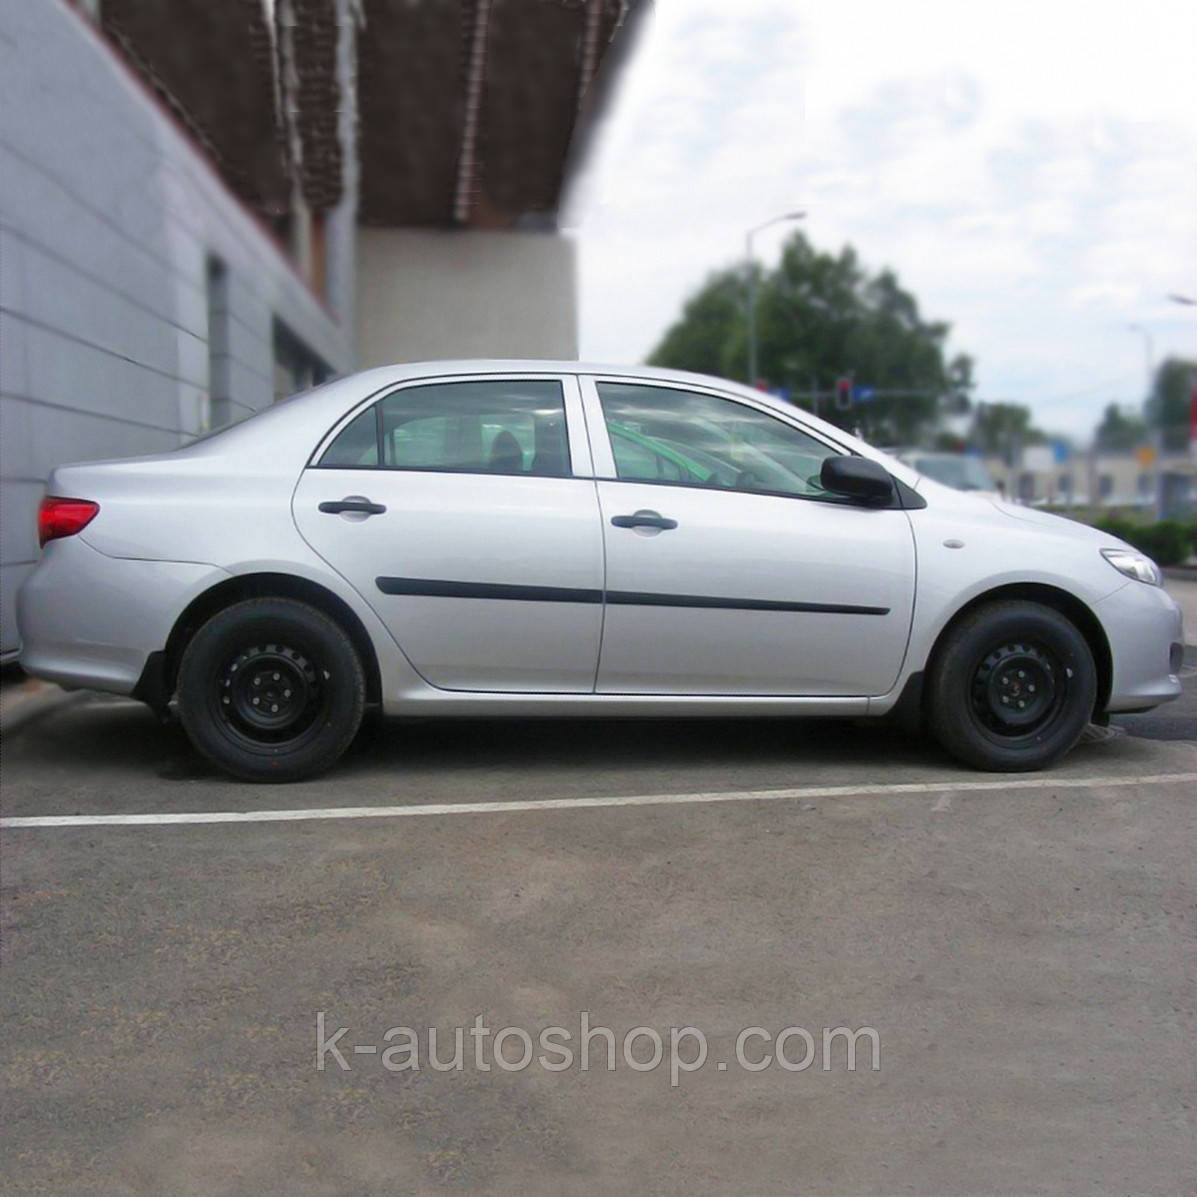 Молдинги на двери для Toyota Corolla 2006-2012